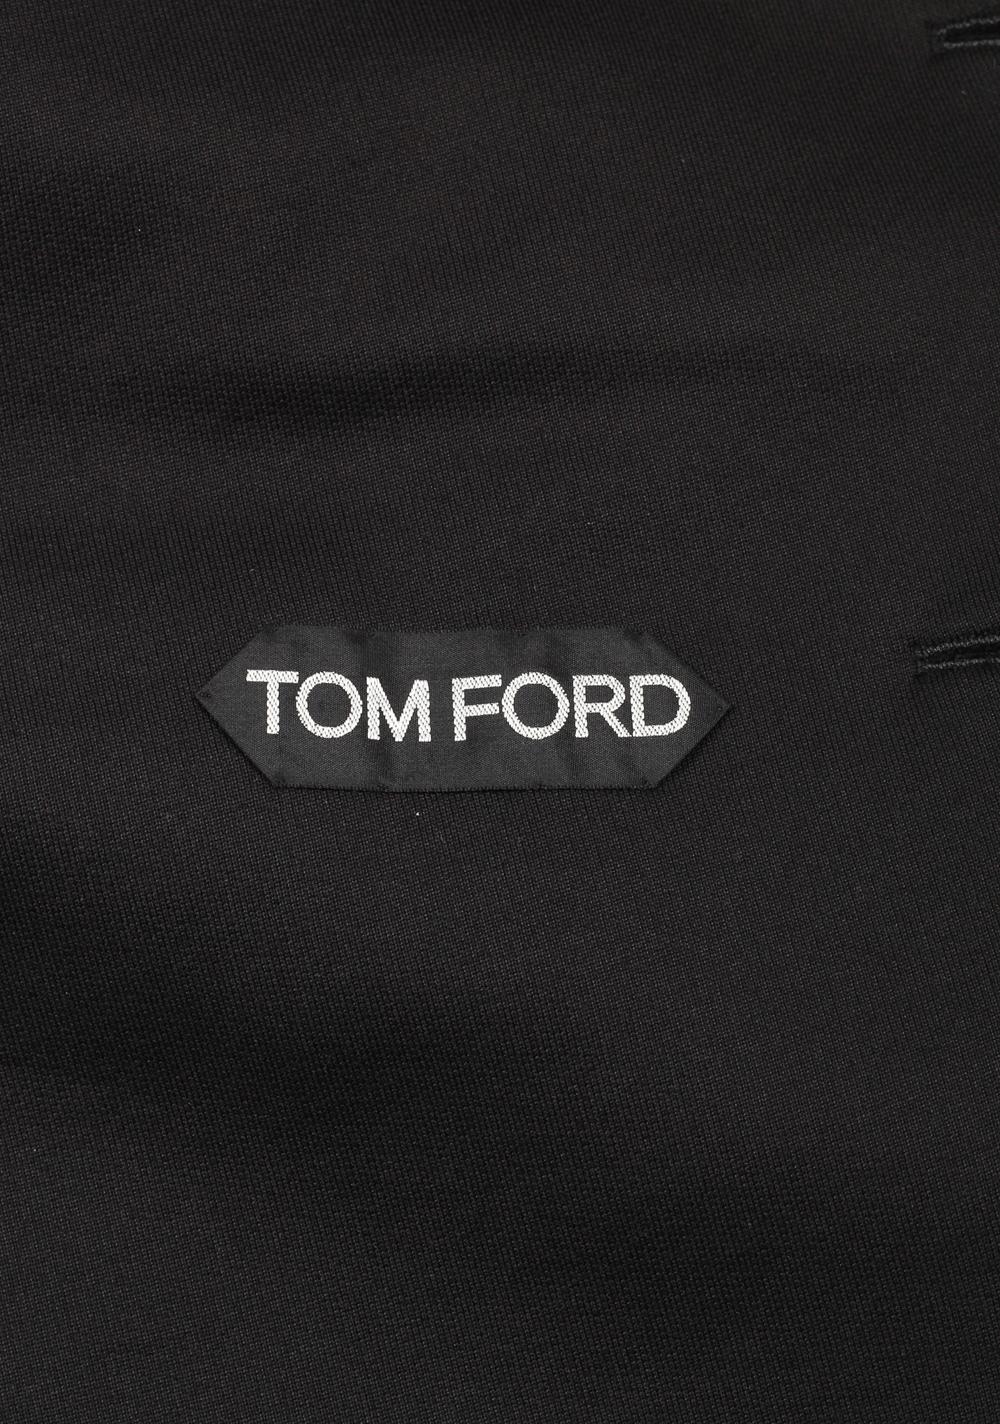 TOM FORD O'Connor Black Tuxedo Dinner Jacket   Costume Limité